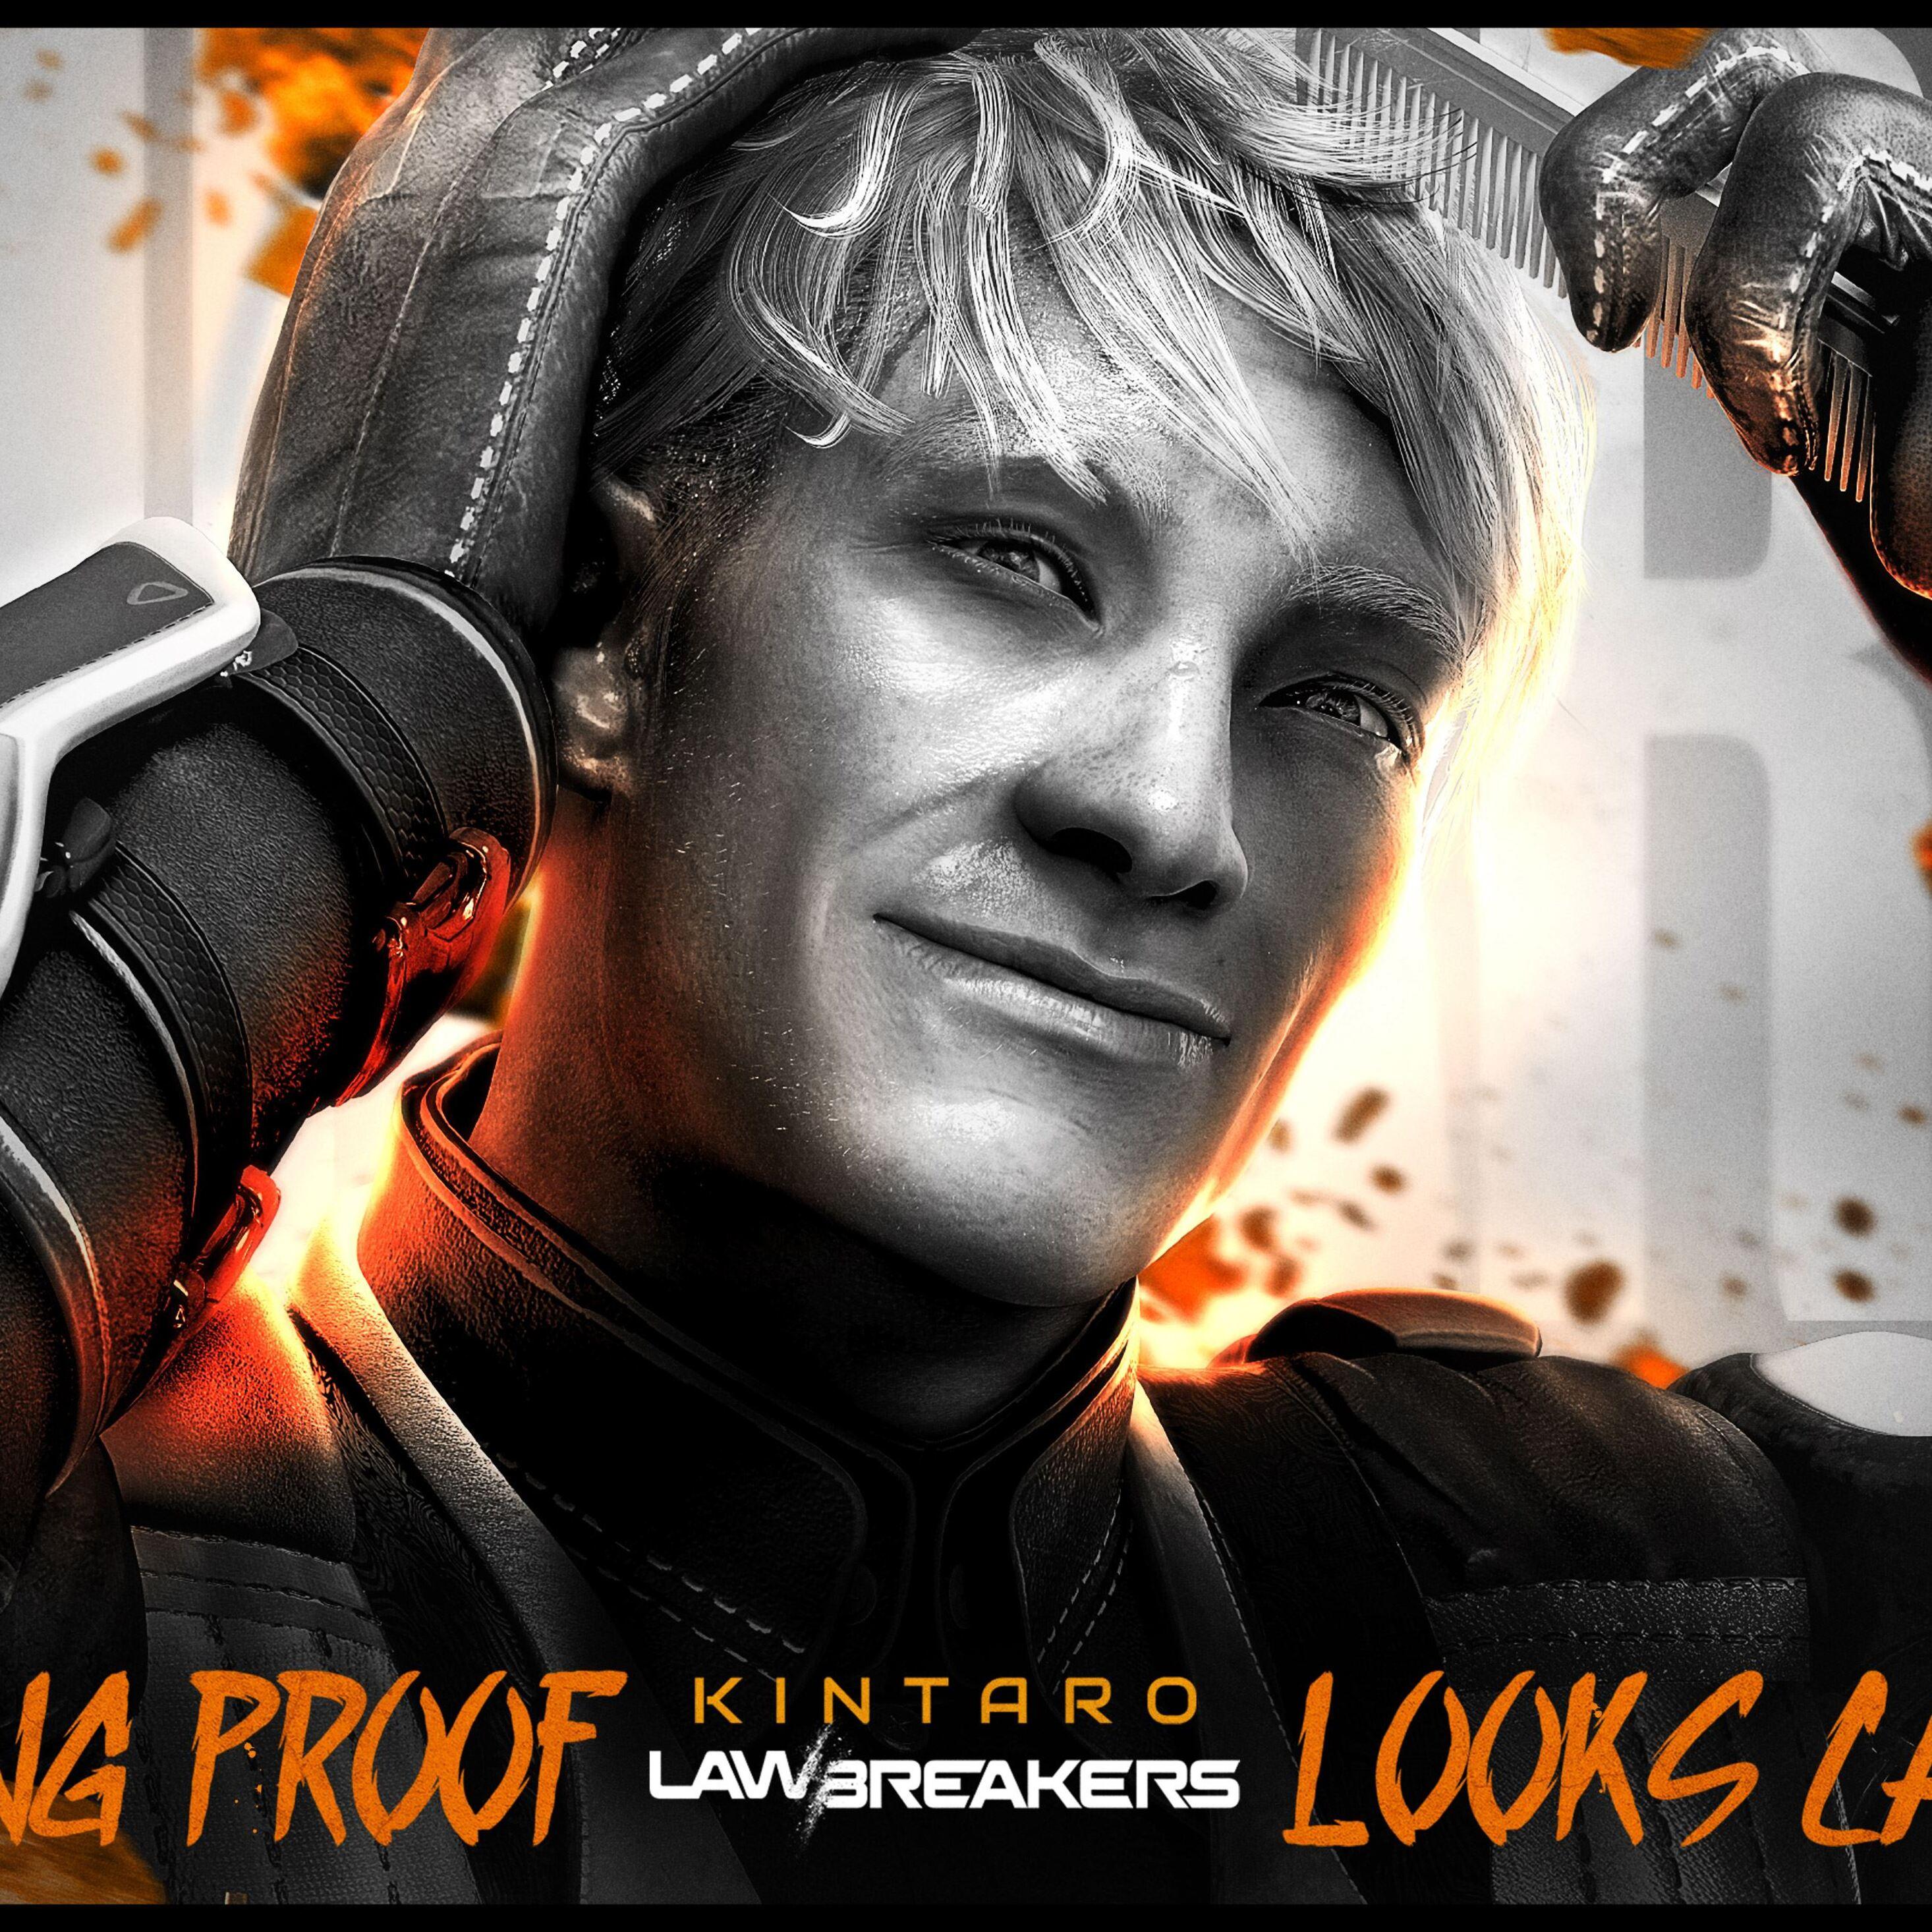 law-breakers-enforcer-breaker-kintaro-headshot-pic.jpg